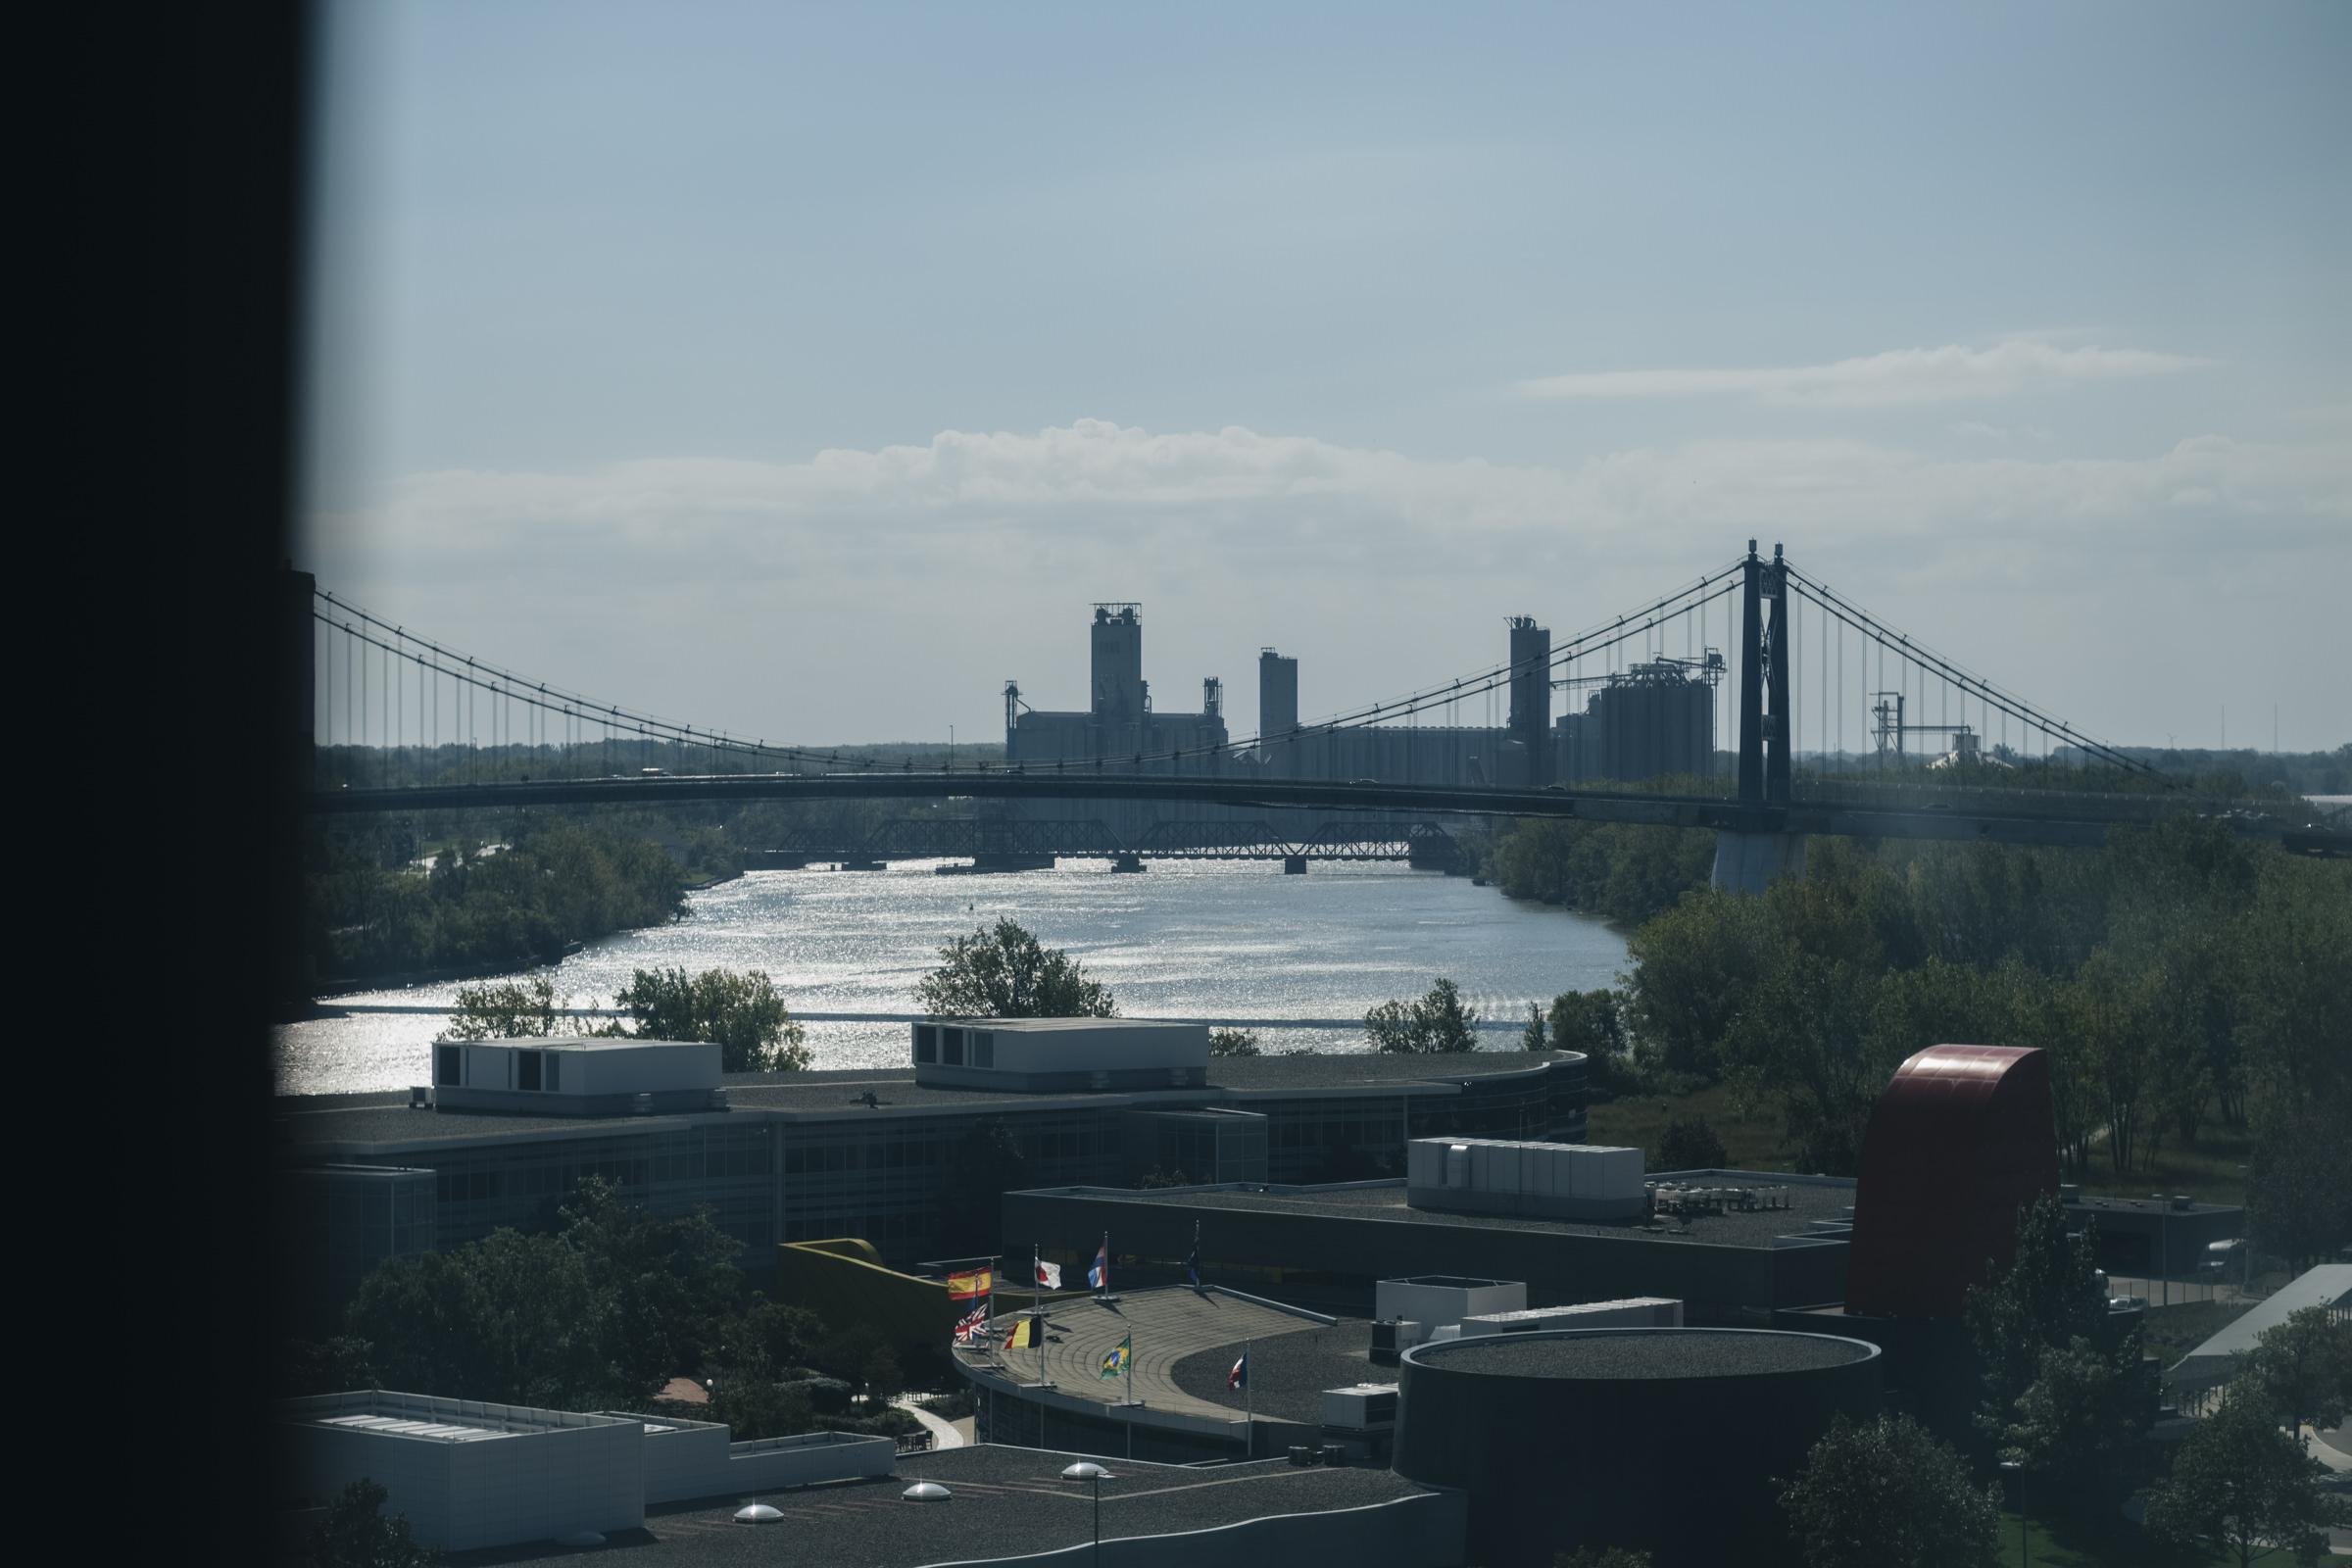 Toledo skyline picture taken from The Park Inn hotel in Ohio